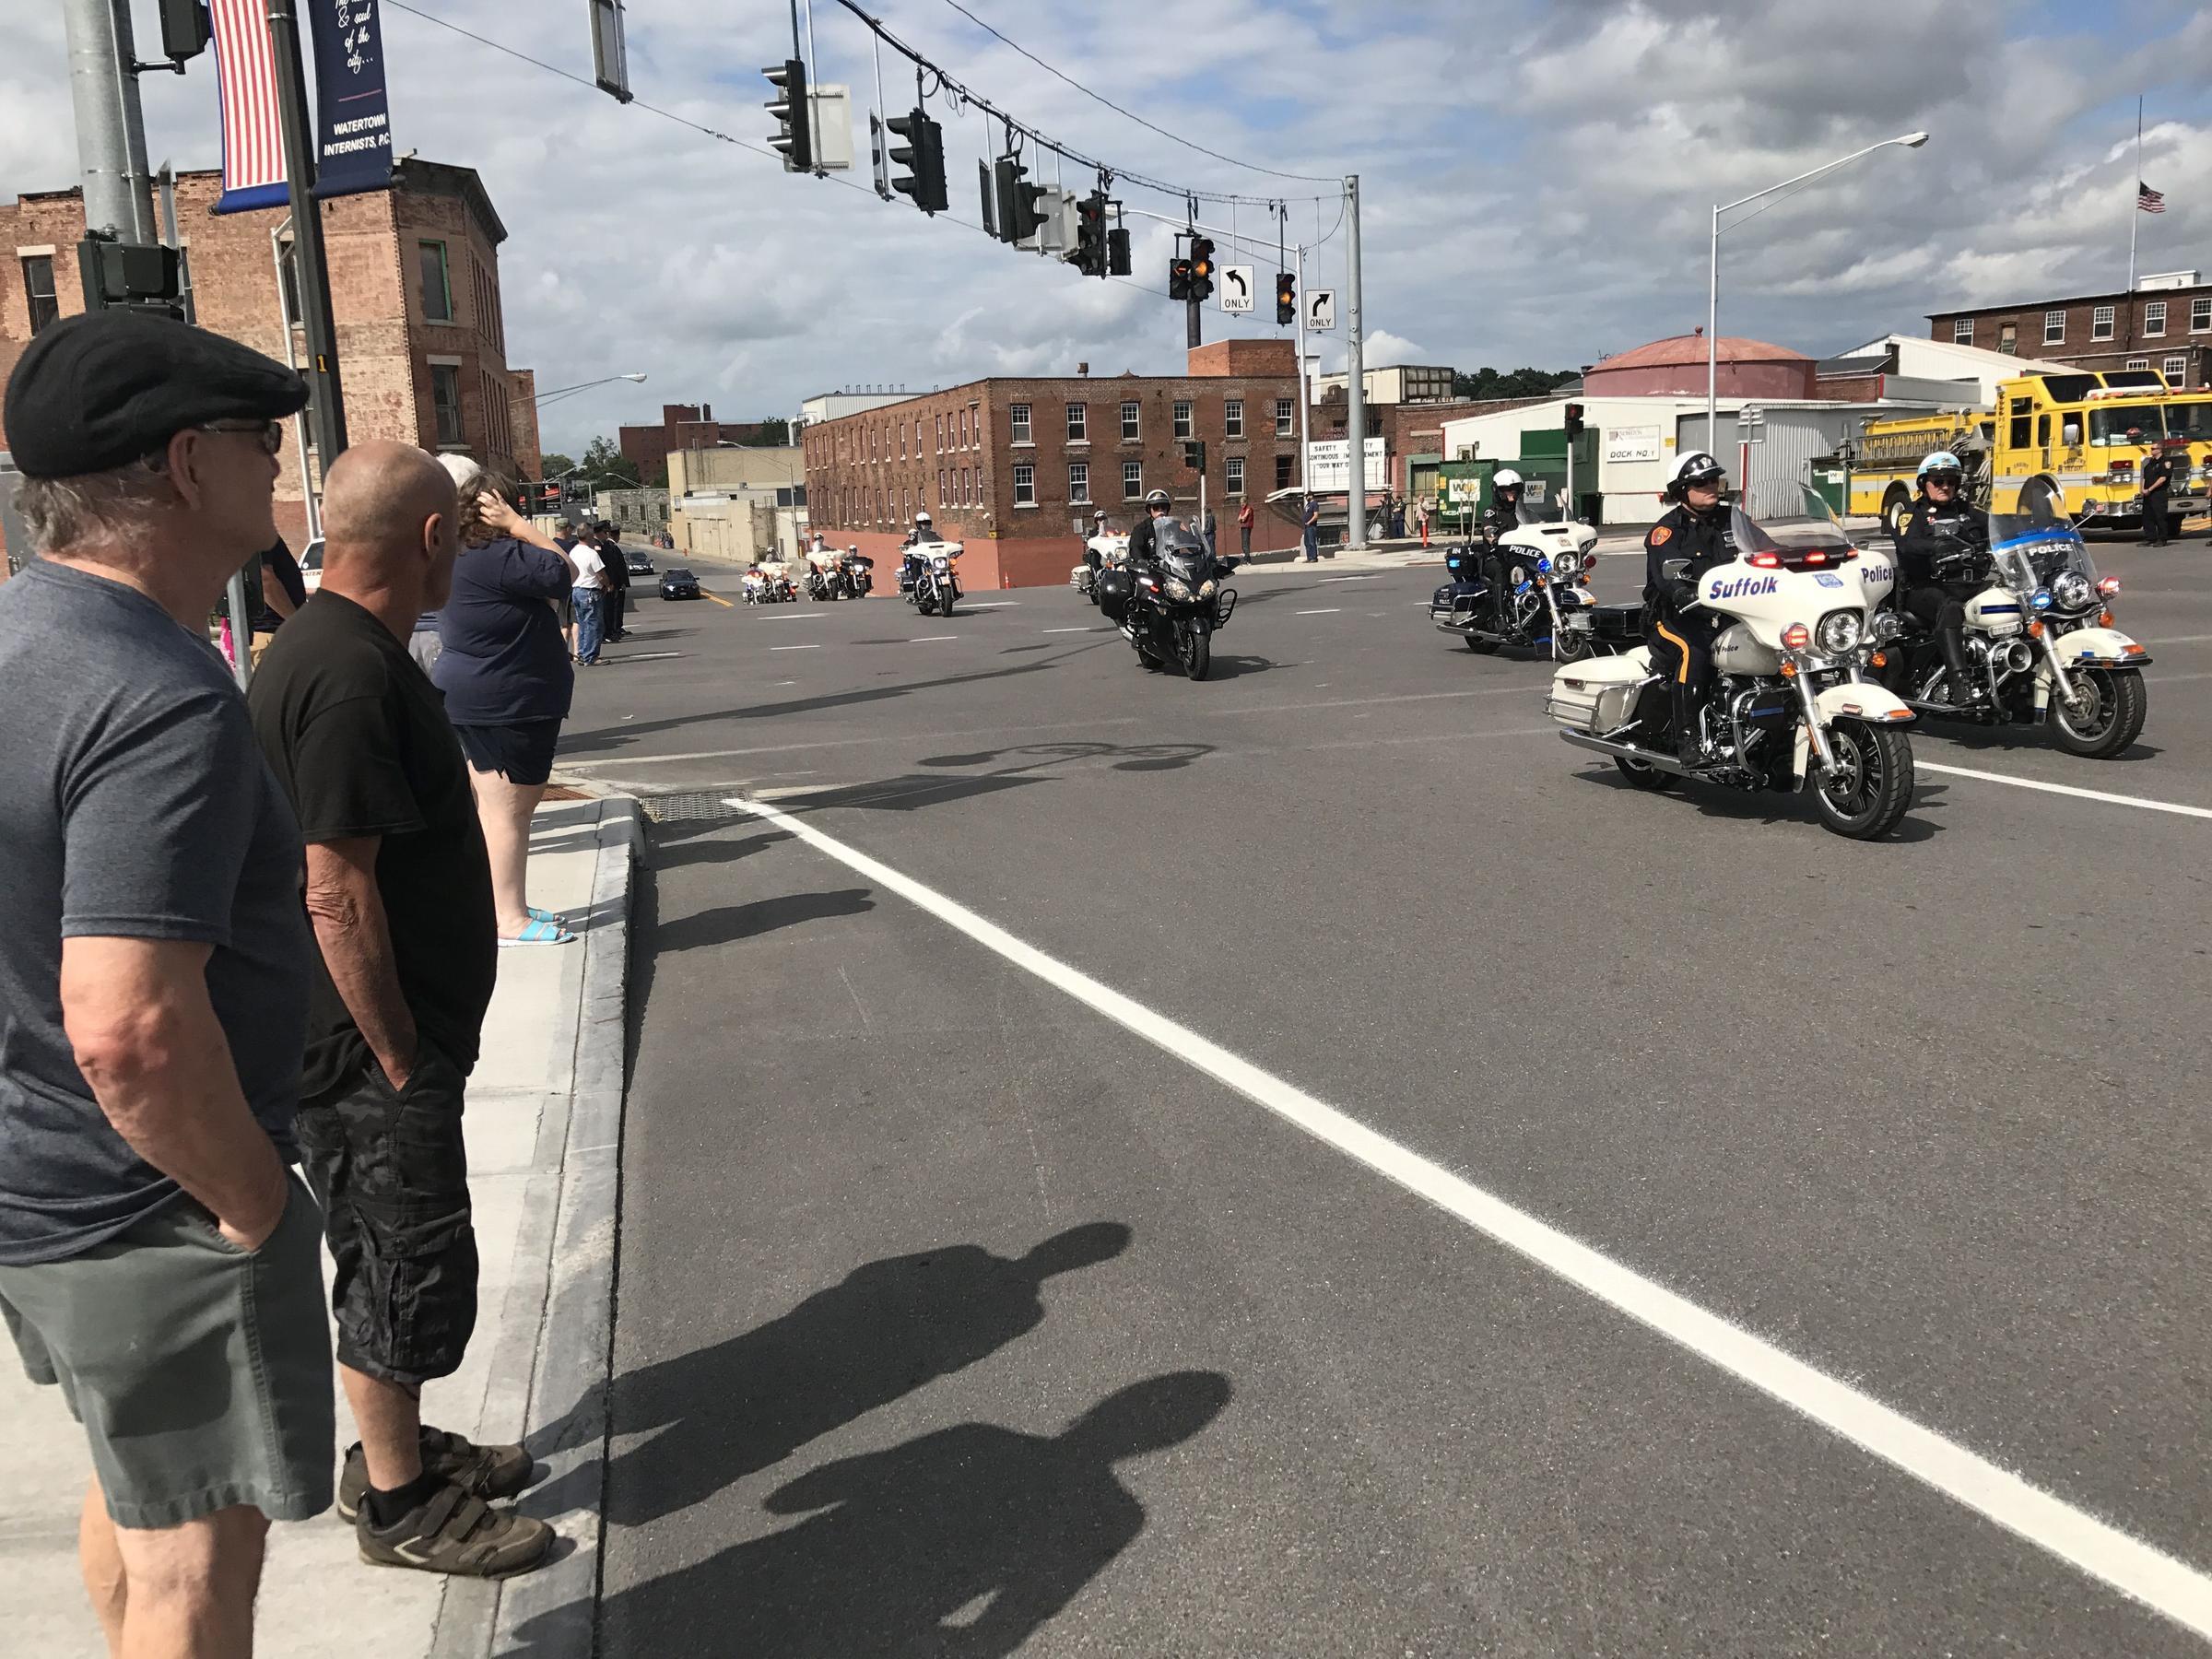 Service arrangements announced for Trooper Joel Davis